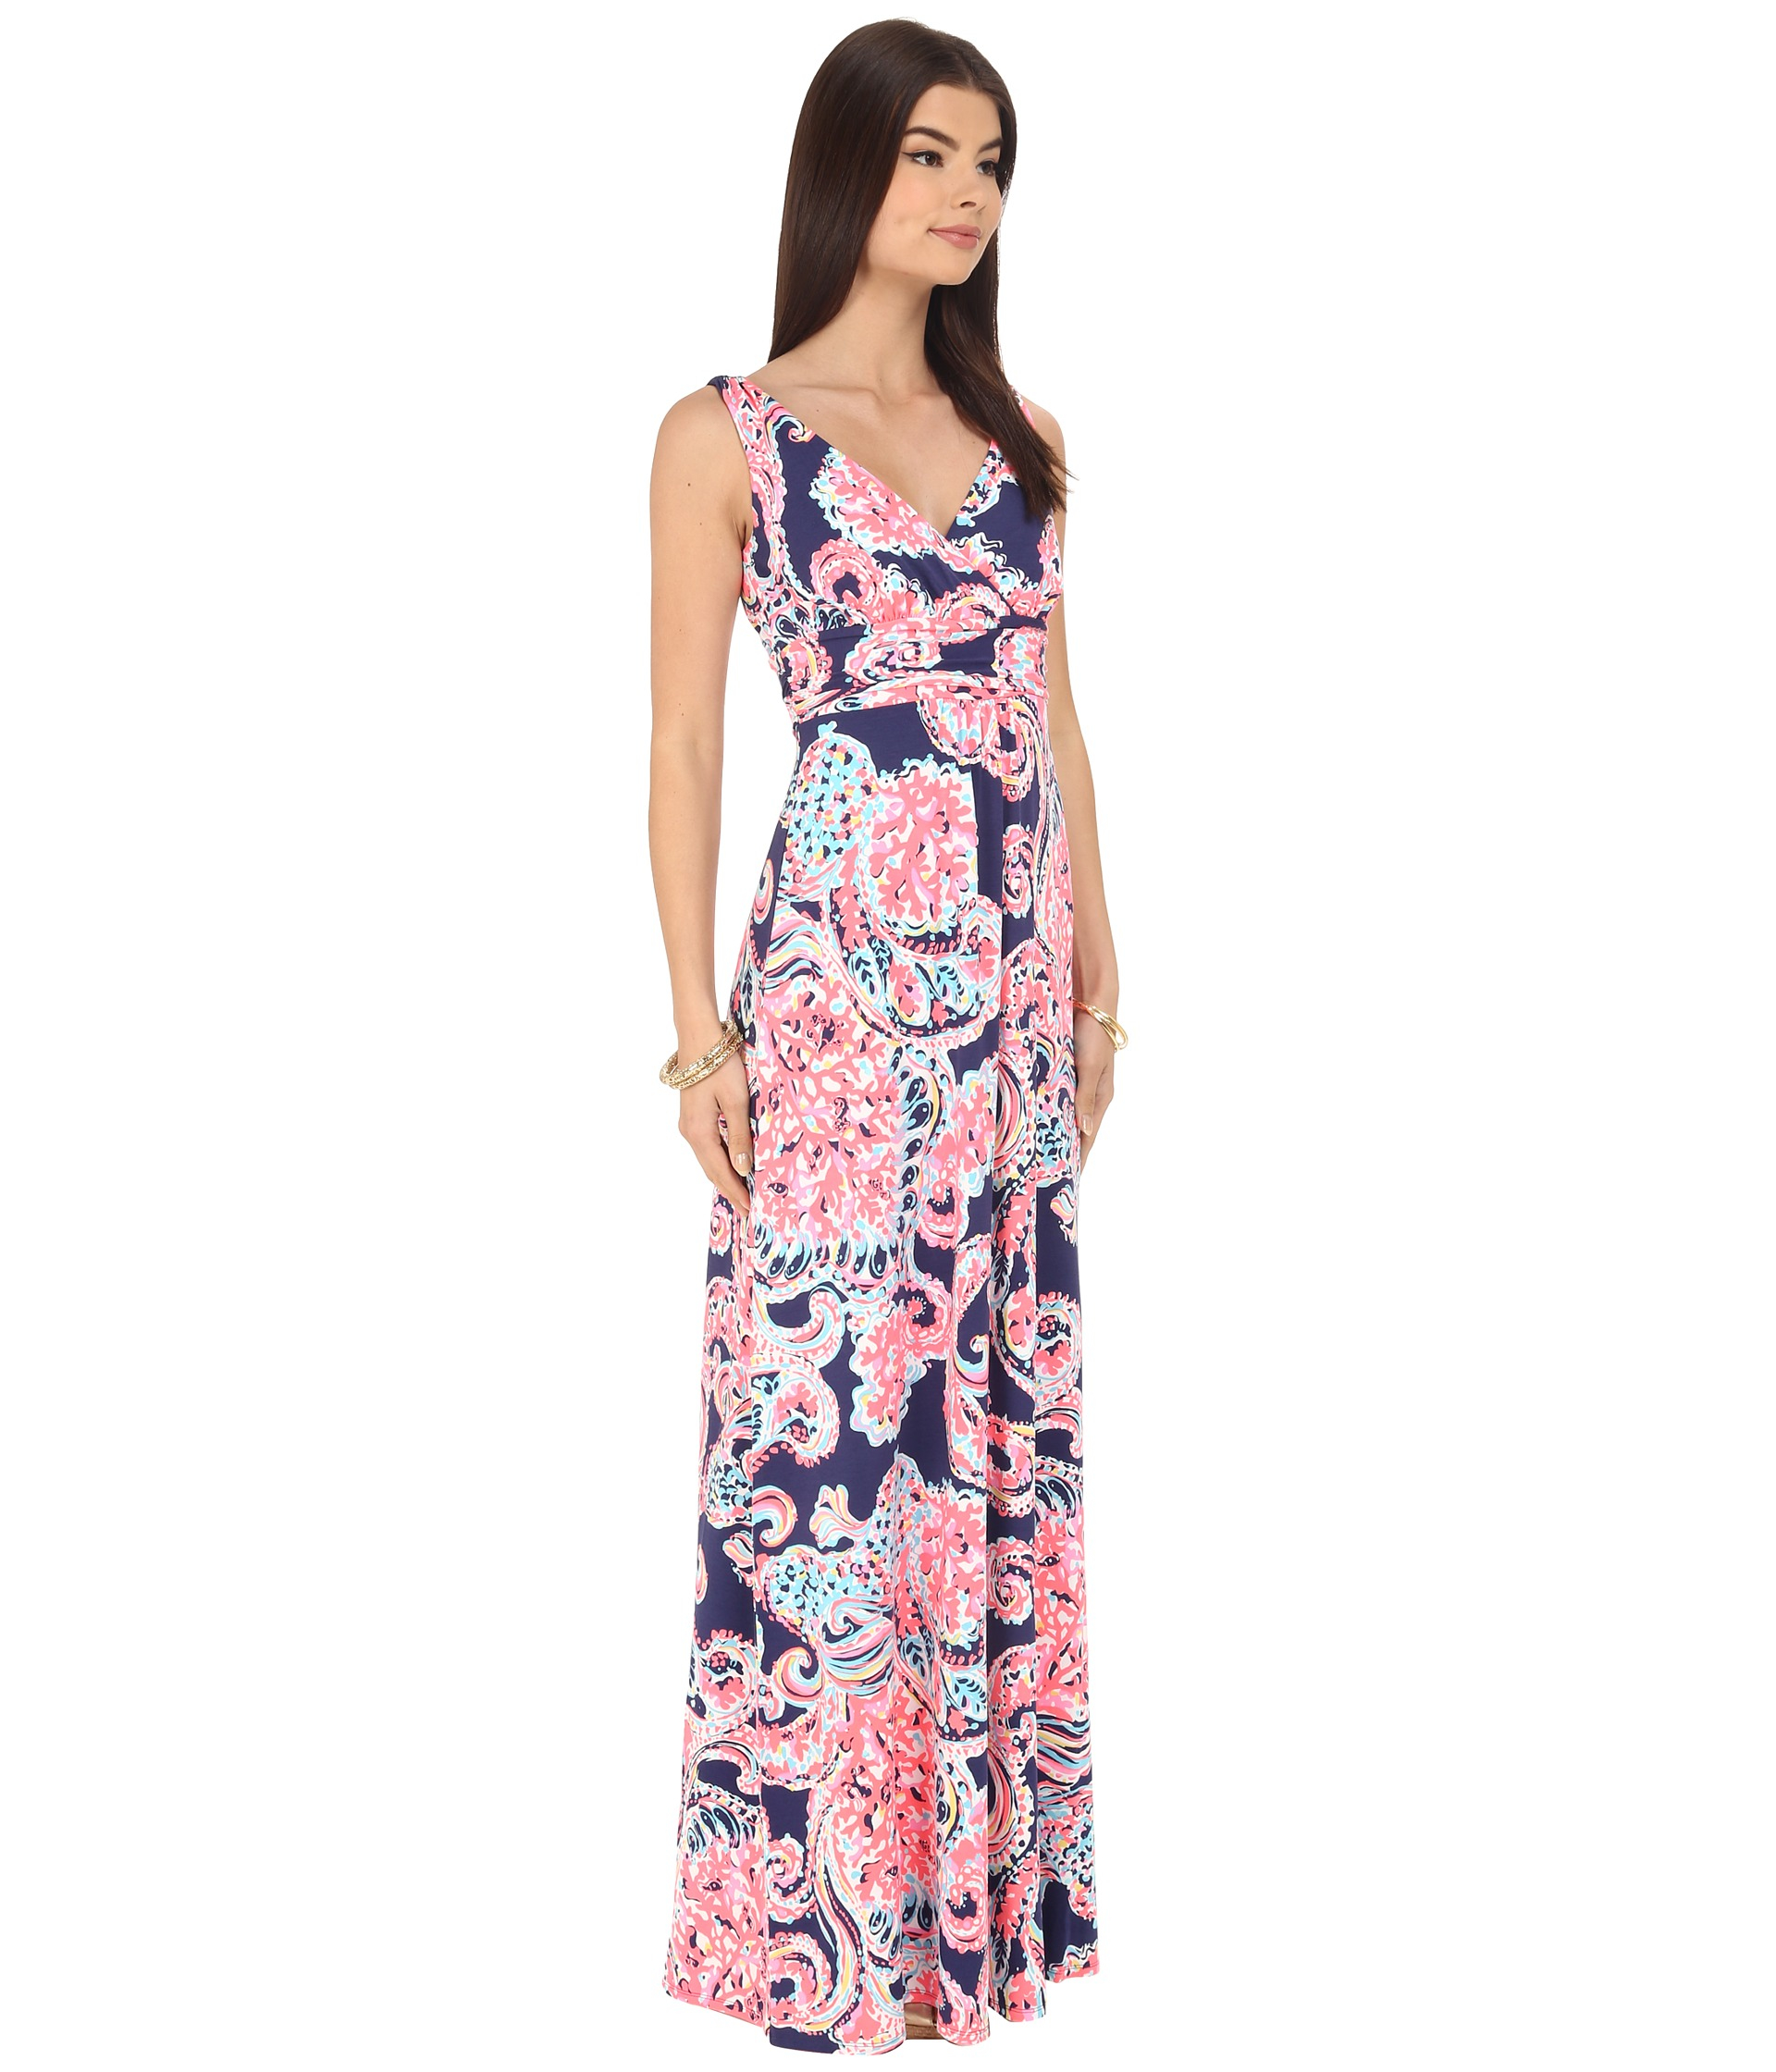 Lyst Lilly Pulitzer Sloane Maxi Dress